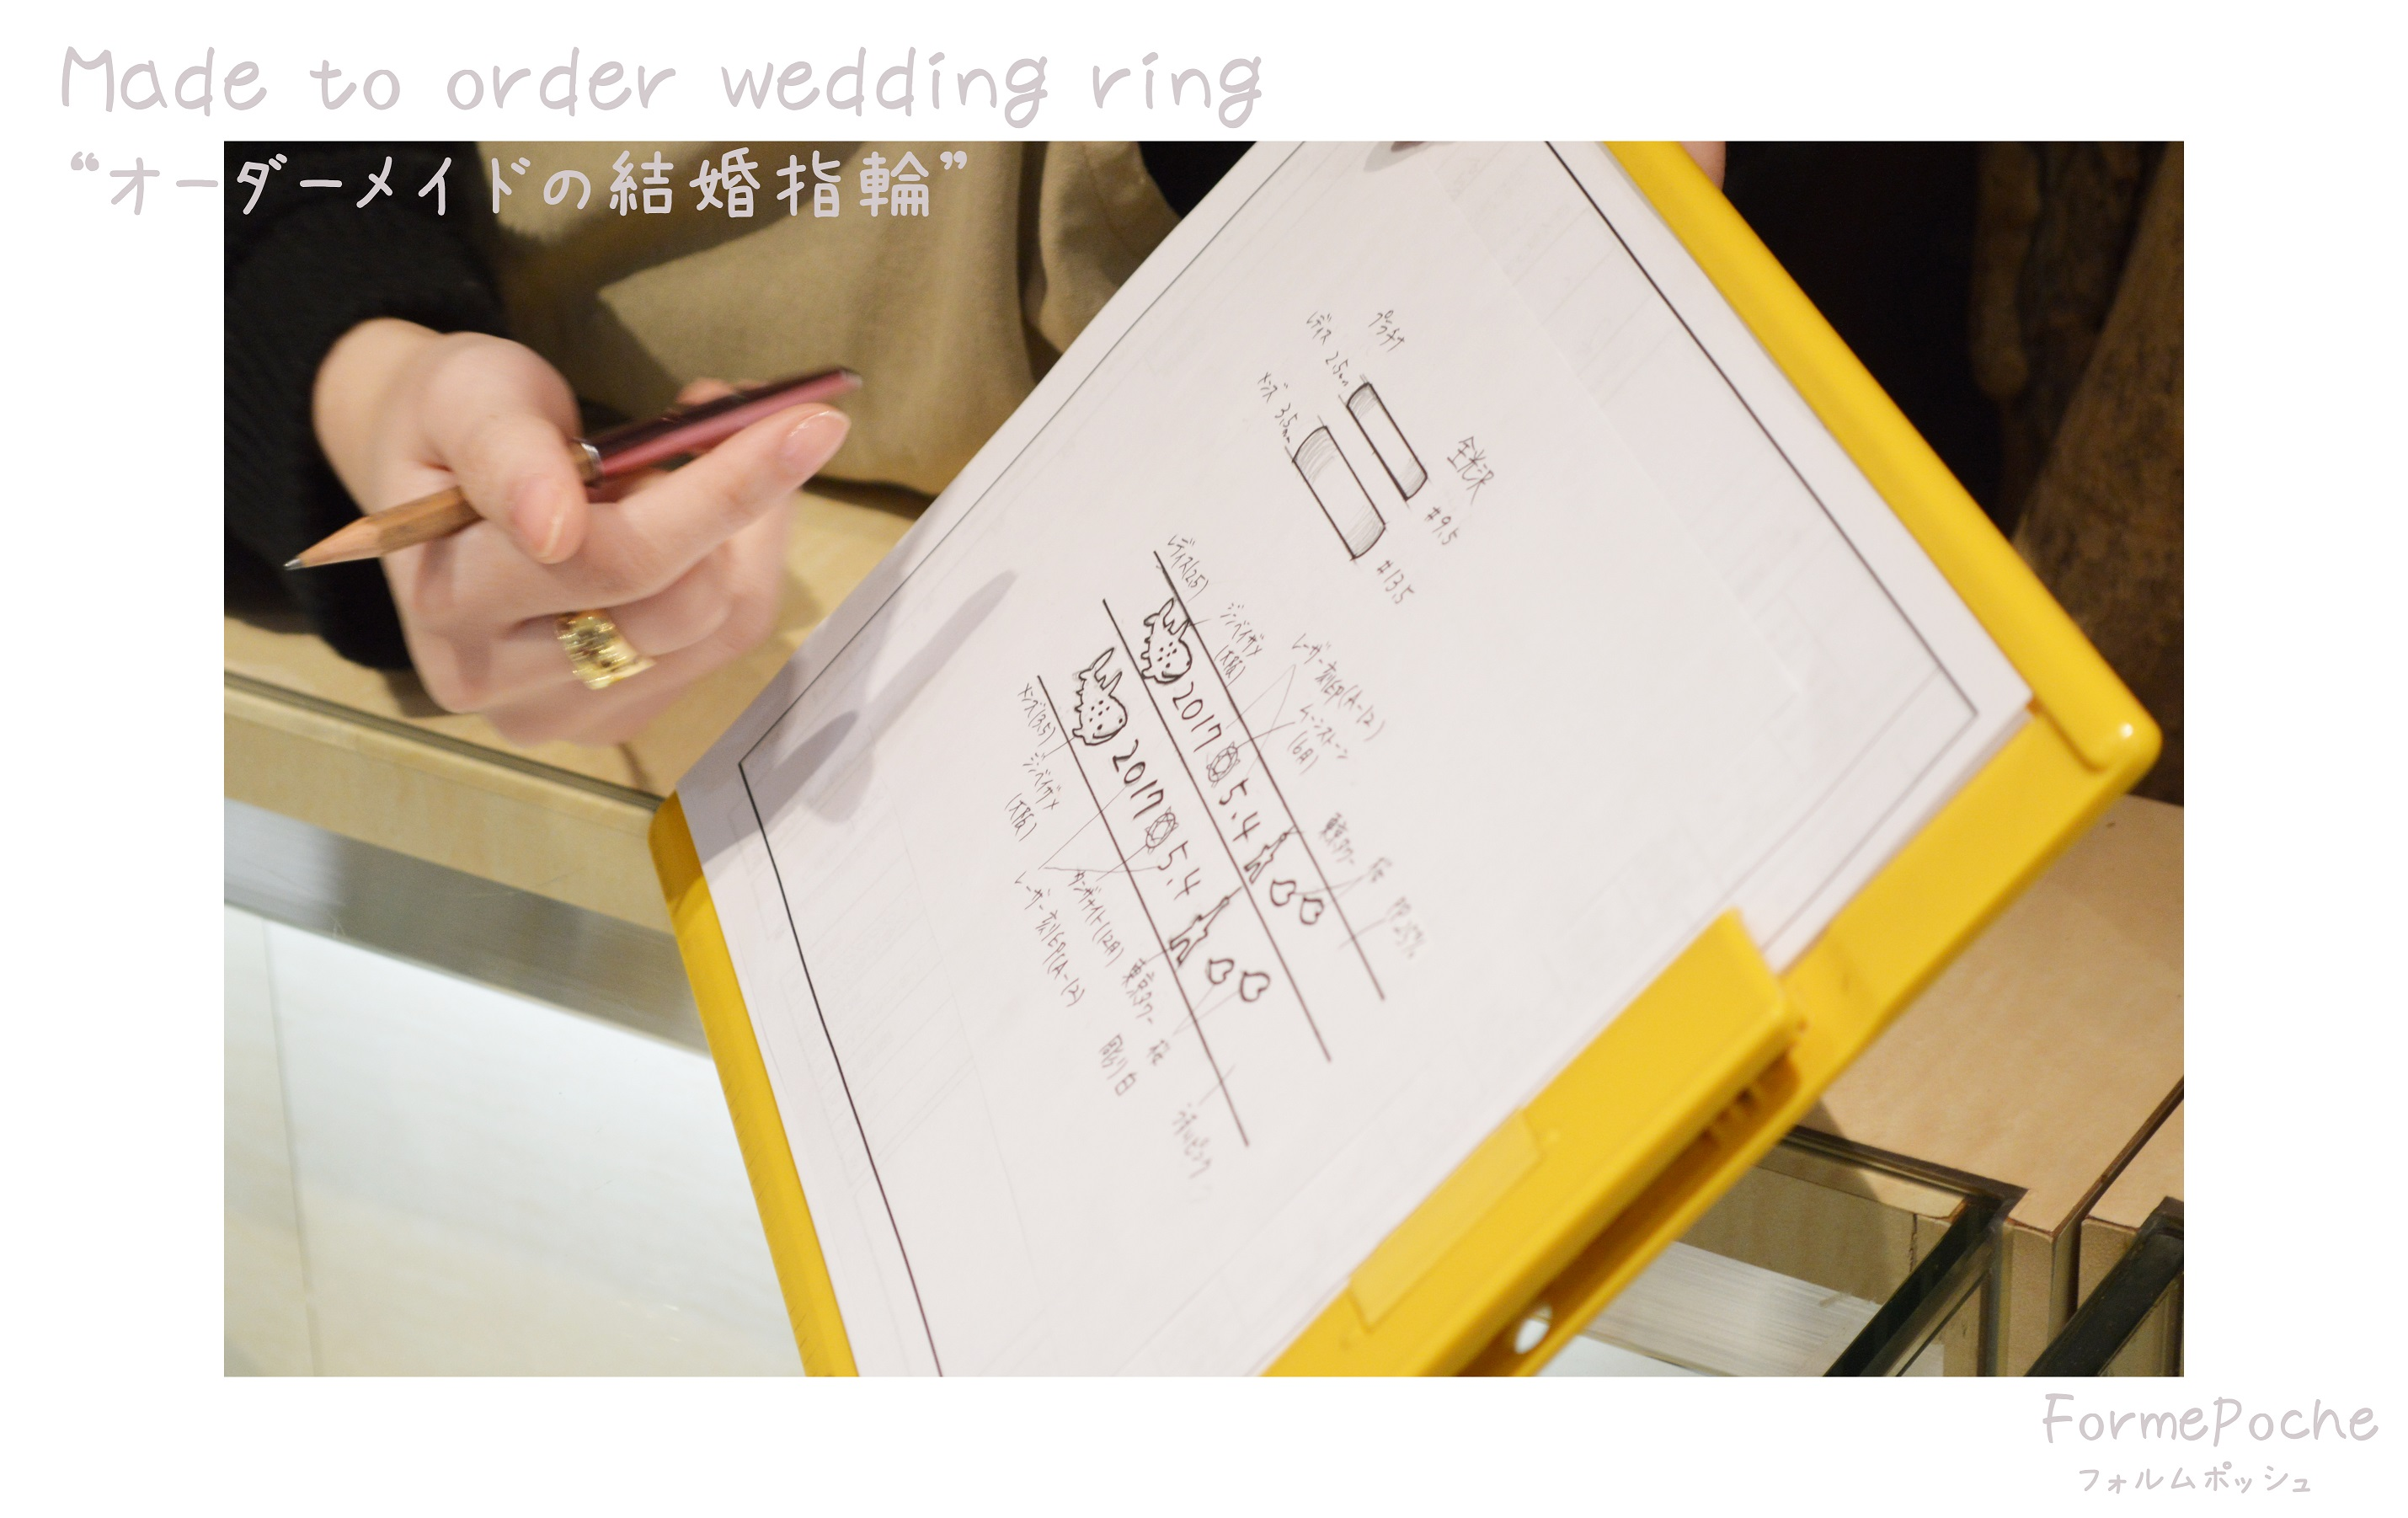 hi180614w1154-2 オリジナルの結婚指輪 ピンク 大阪 東京 刻印 デザイン画